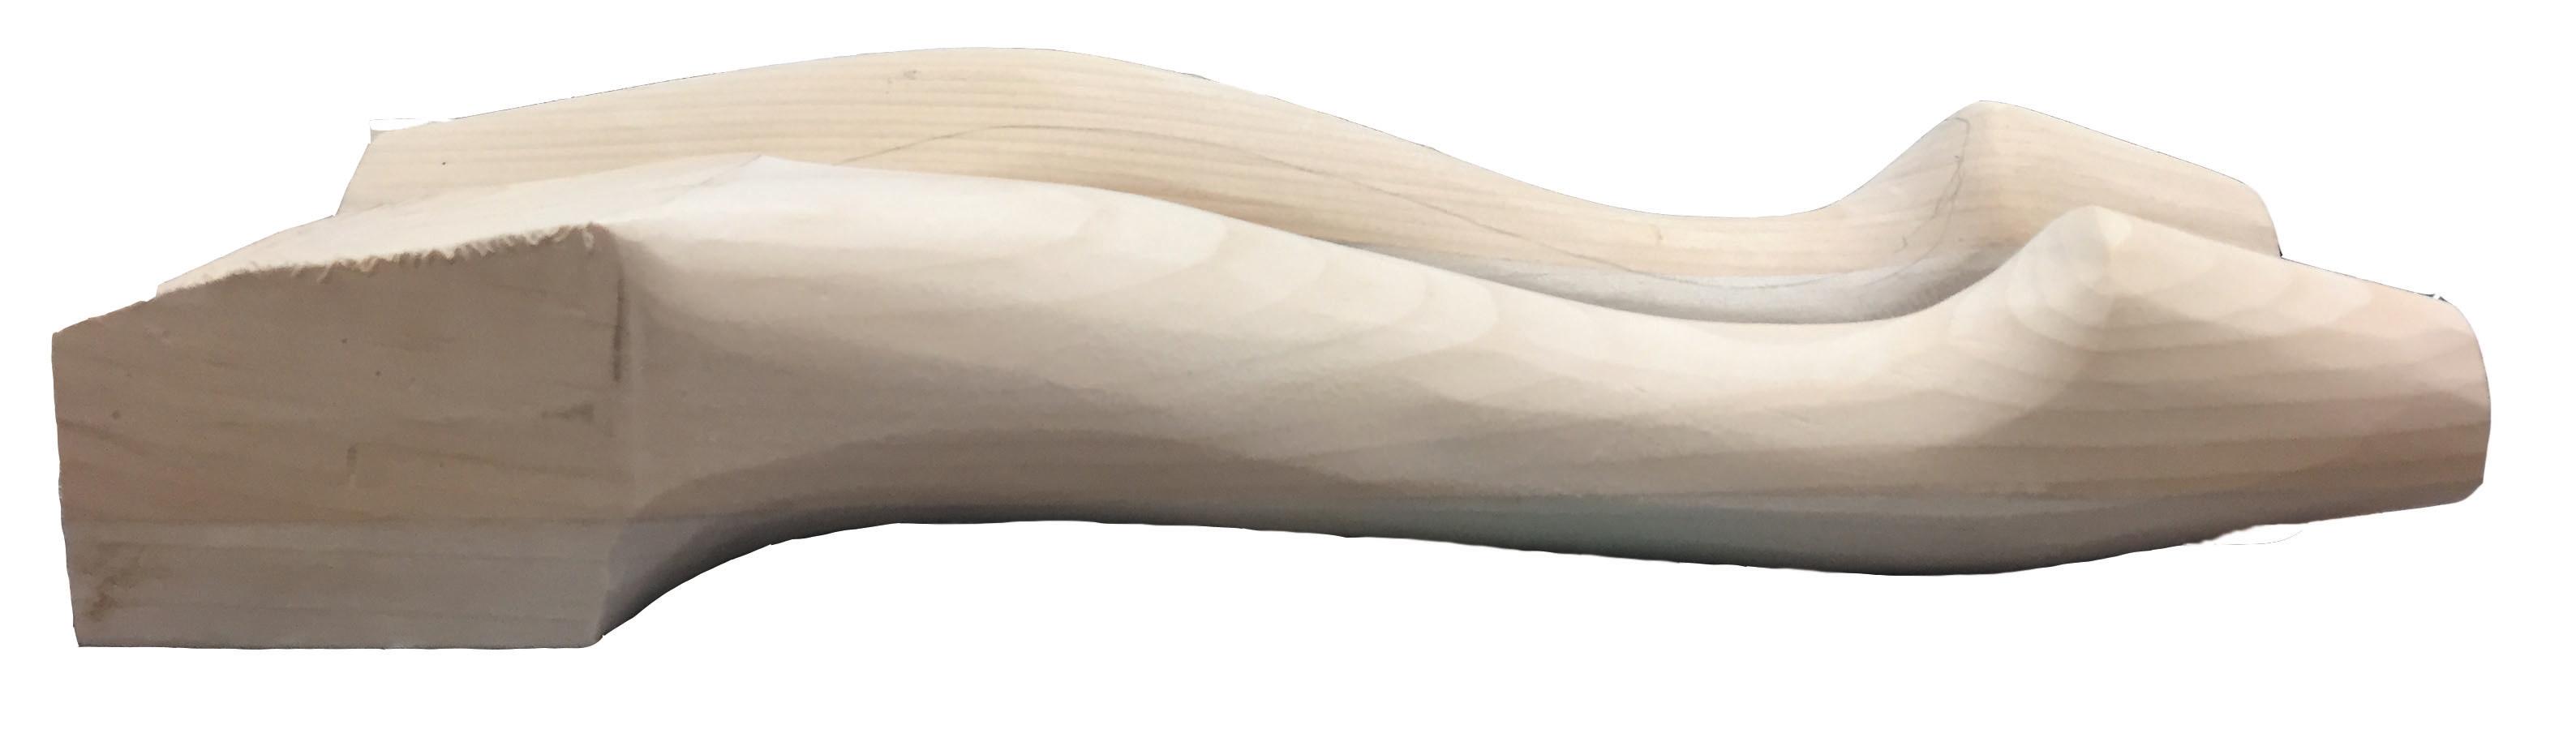 Carved leg